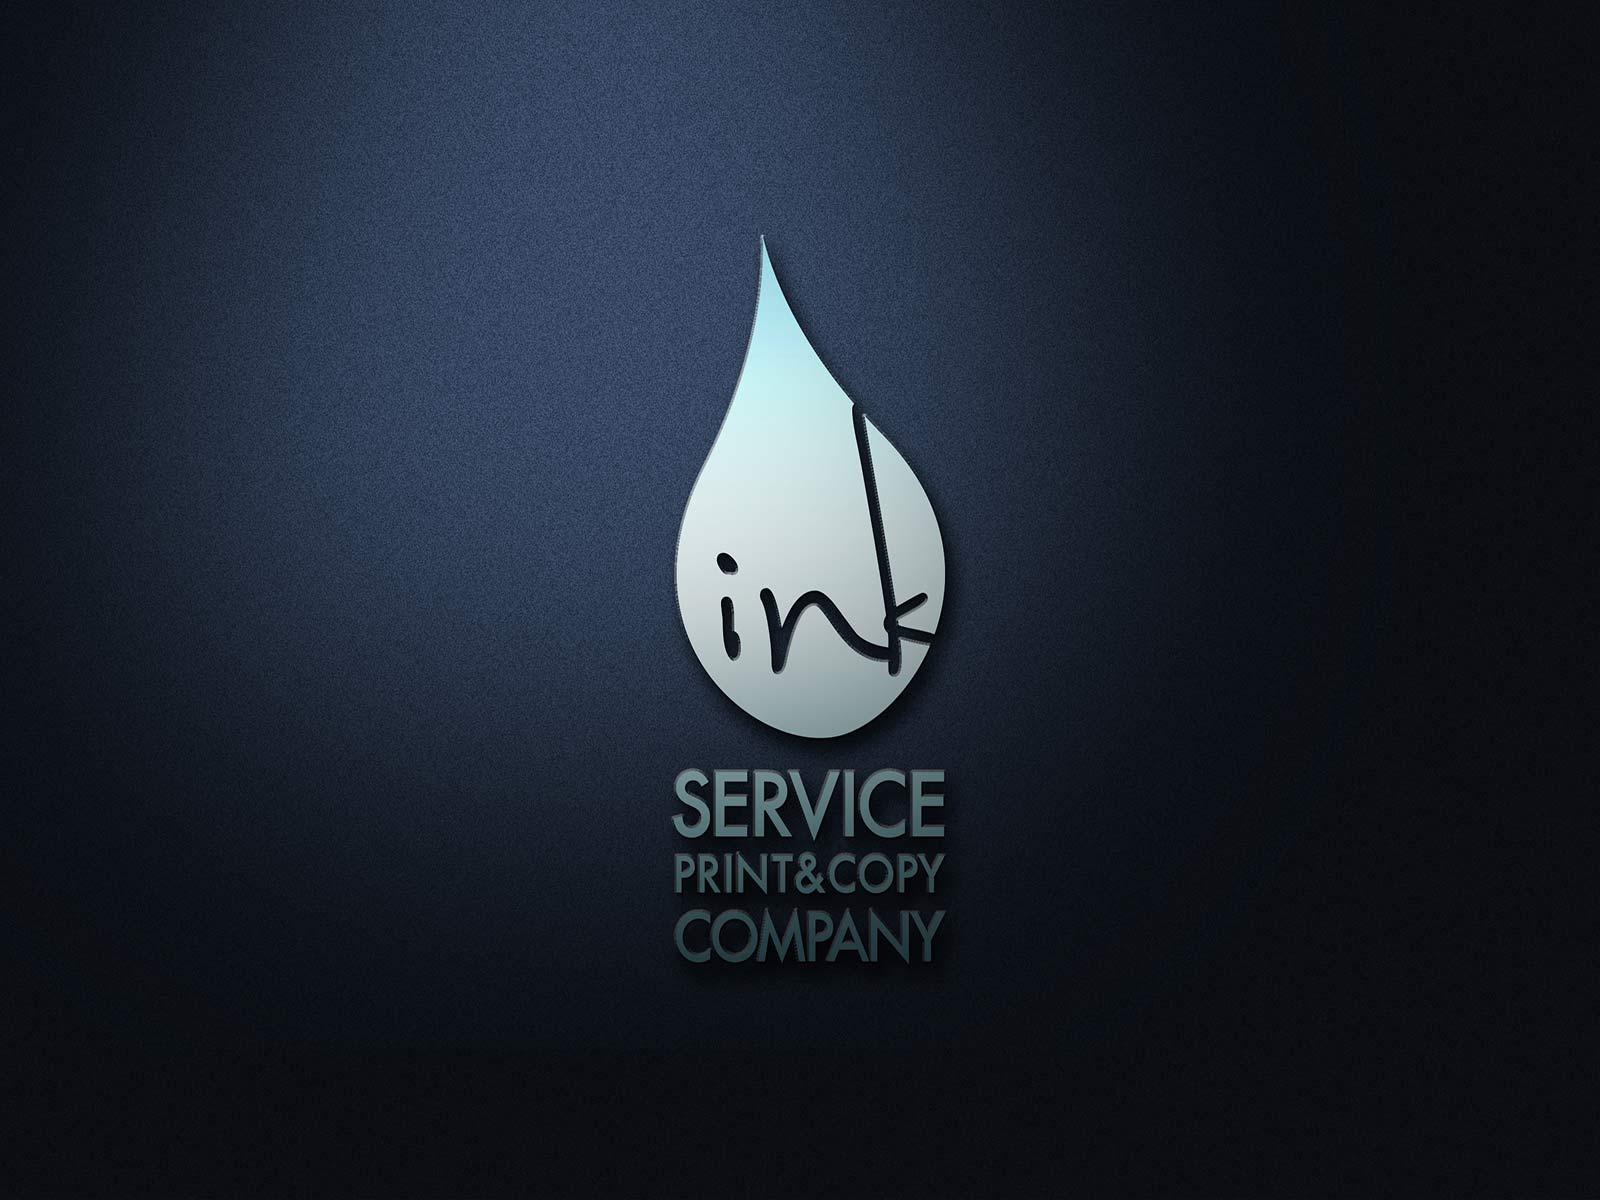 inkservice branding brand persona brand identity kuwait - logo design service